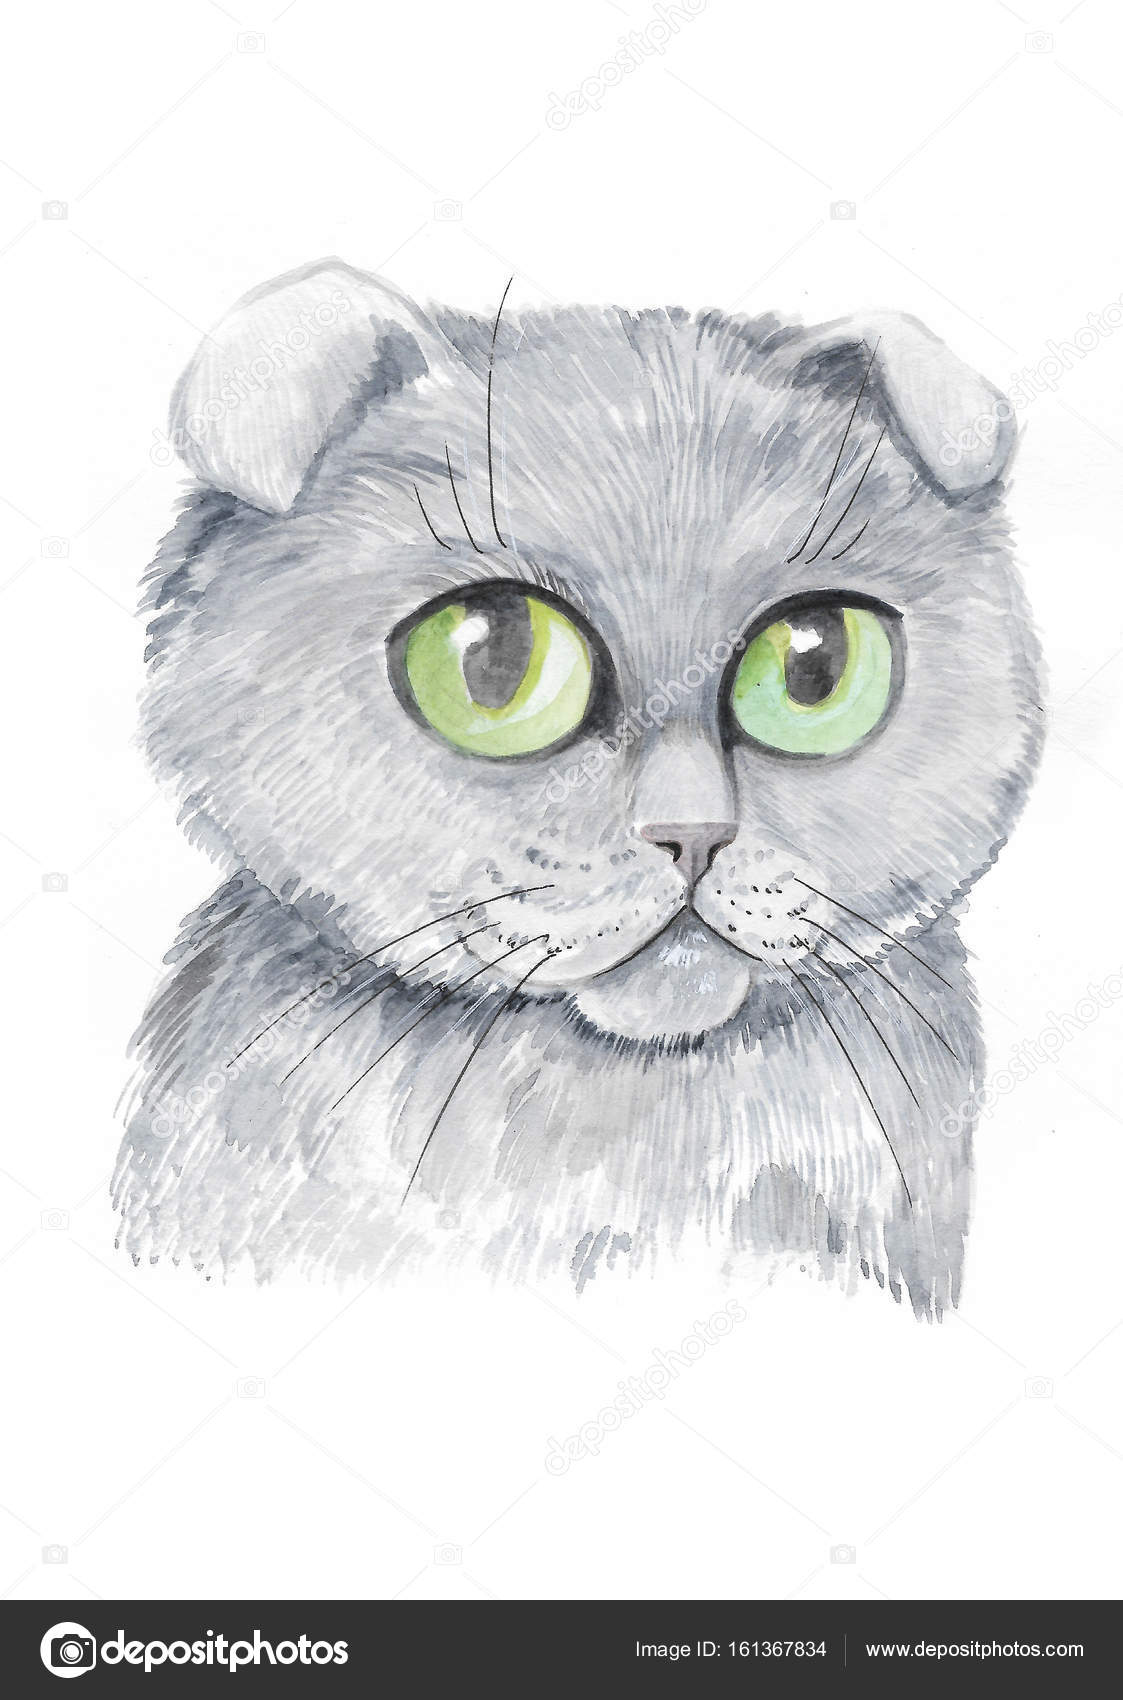 Süße Katze in Aquarell gemalt — Stockfoto © YuliaRey #161367834